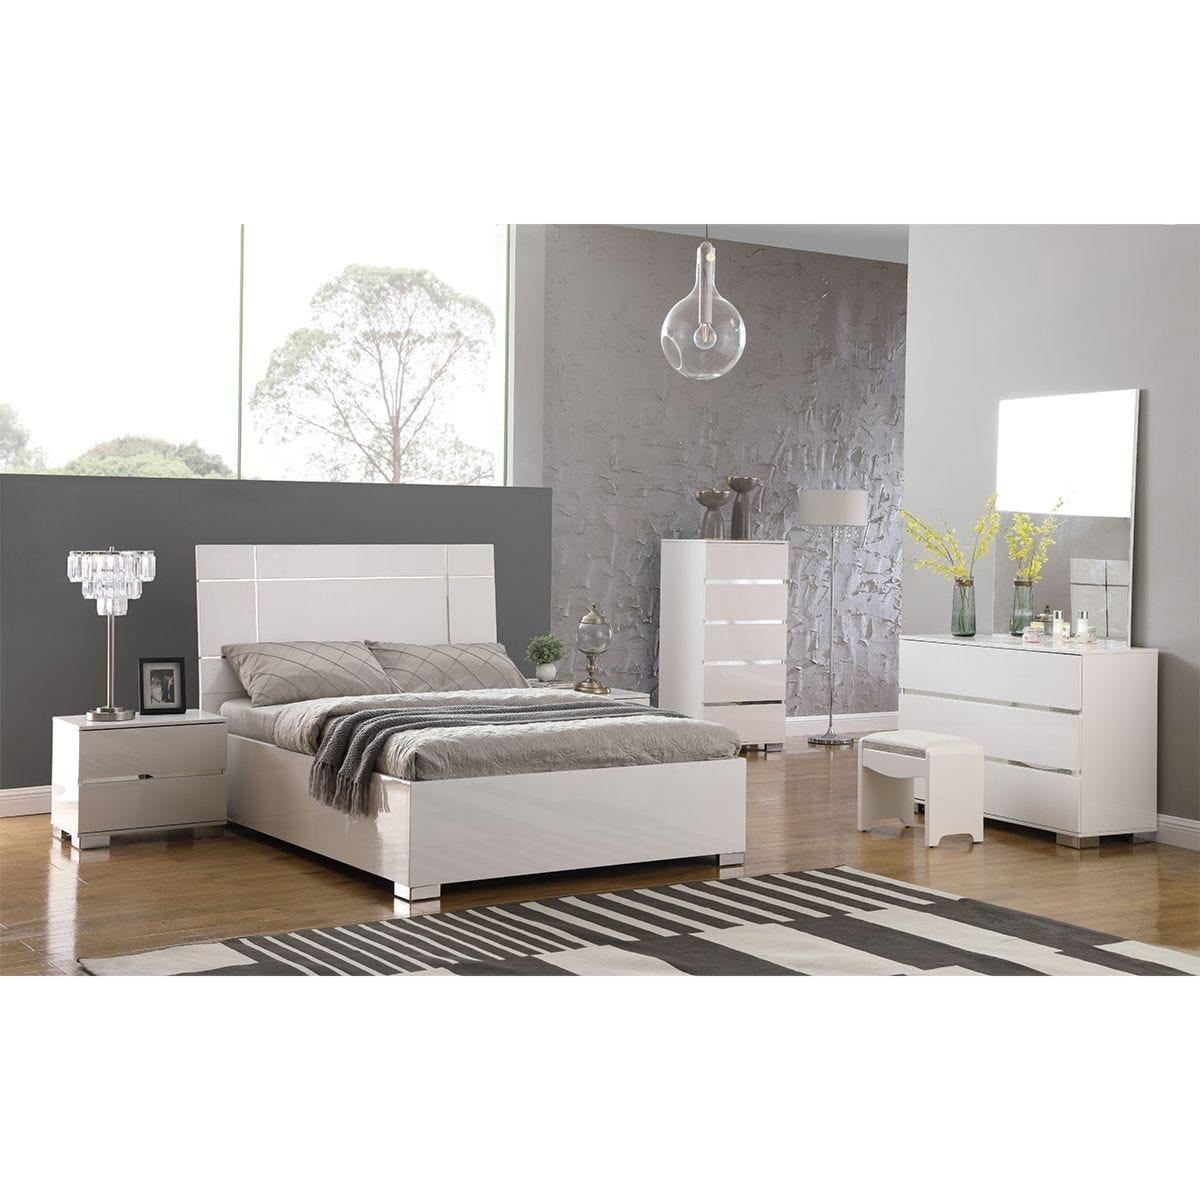 Helsinki High Gloss Double Bed - White